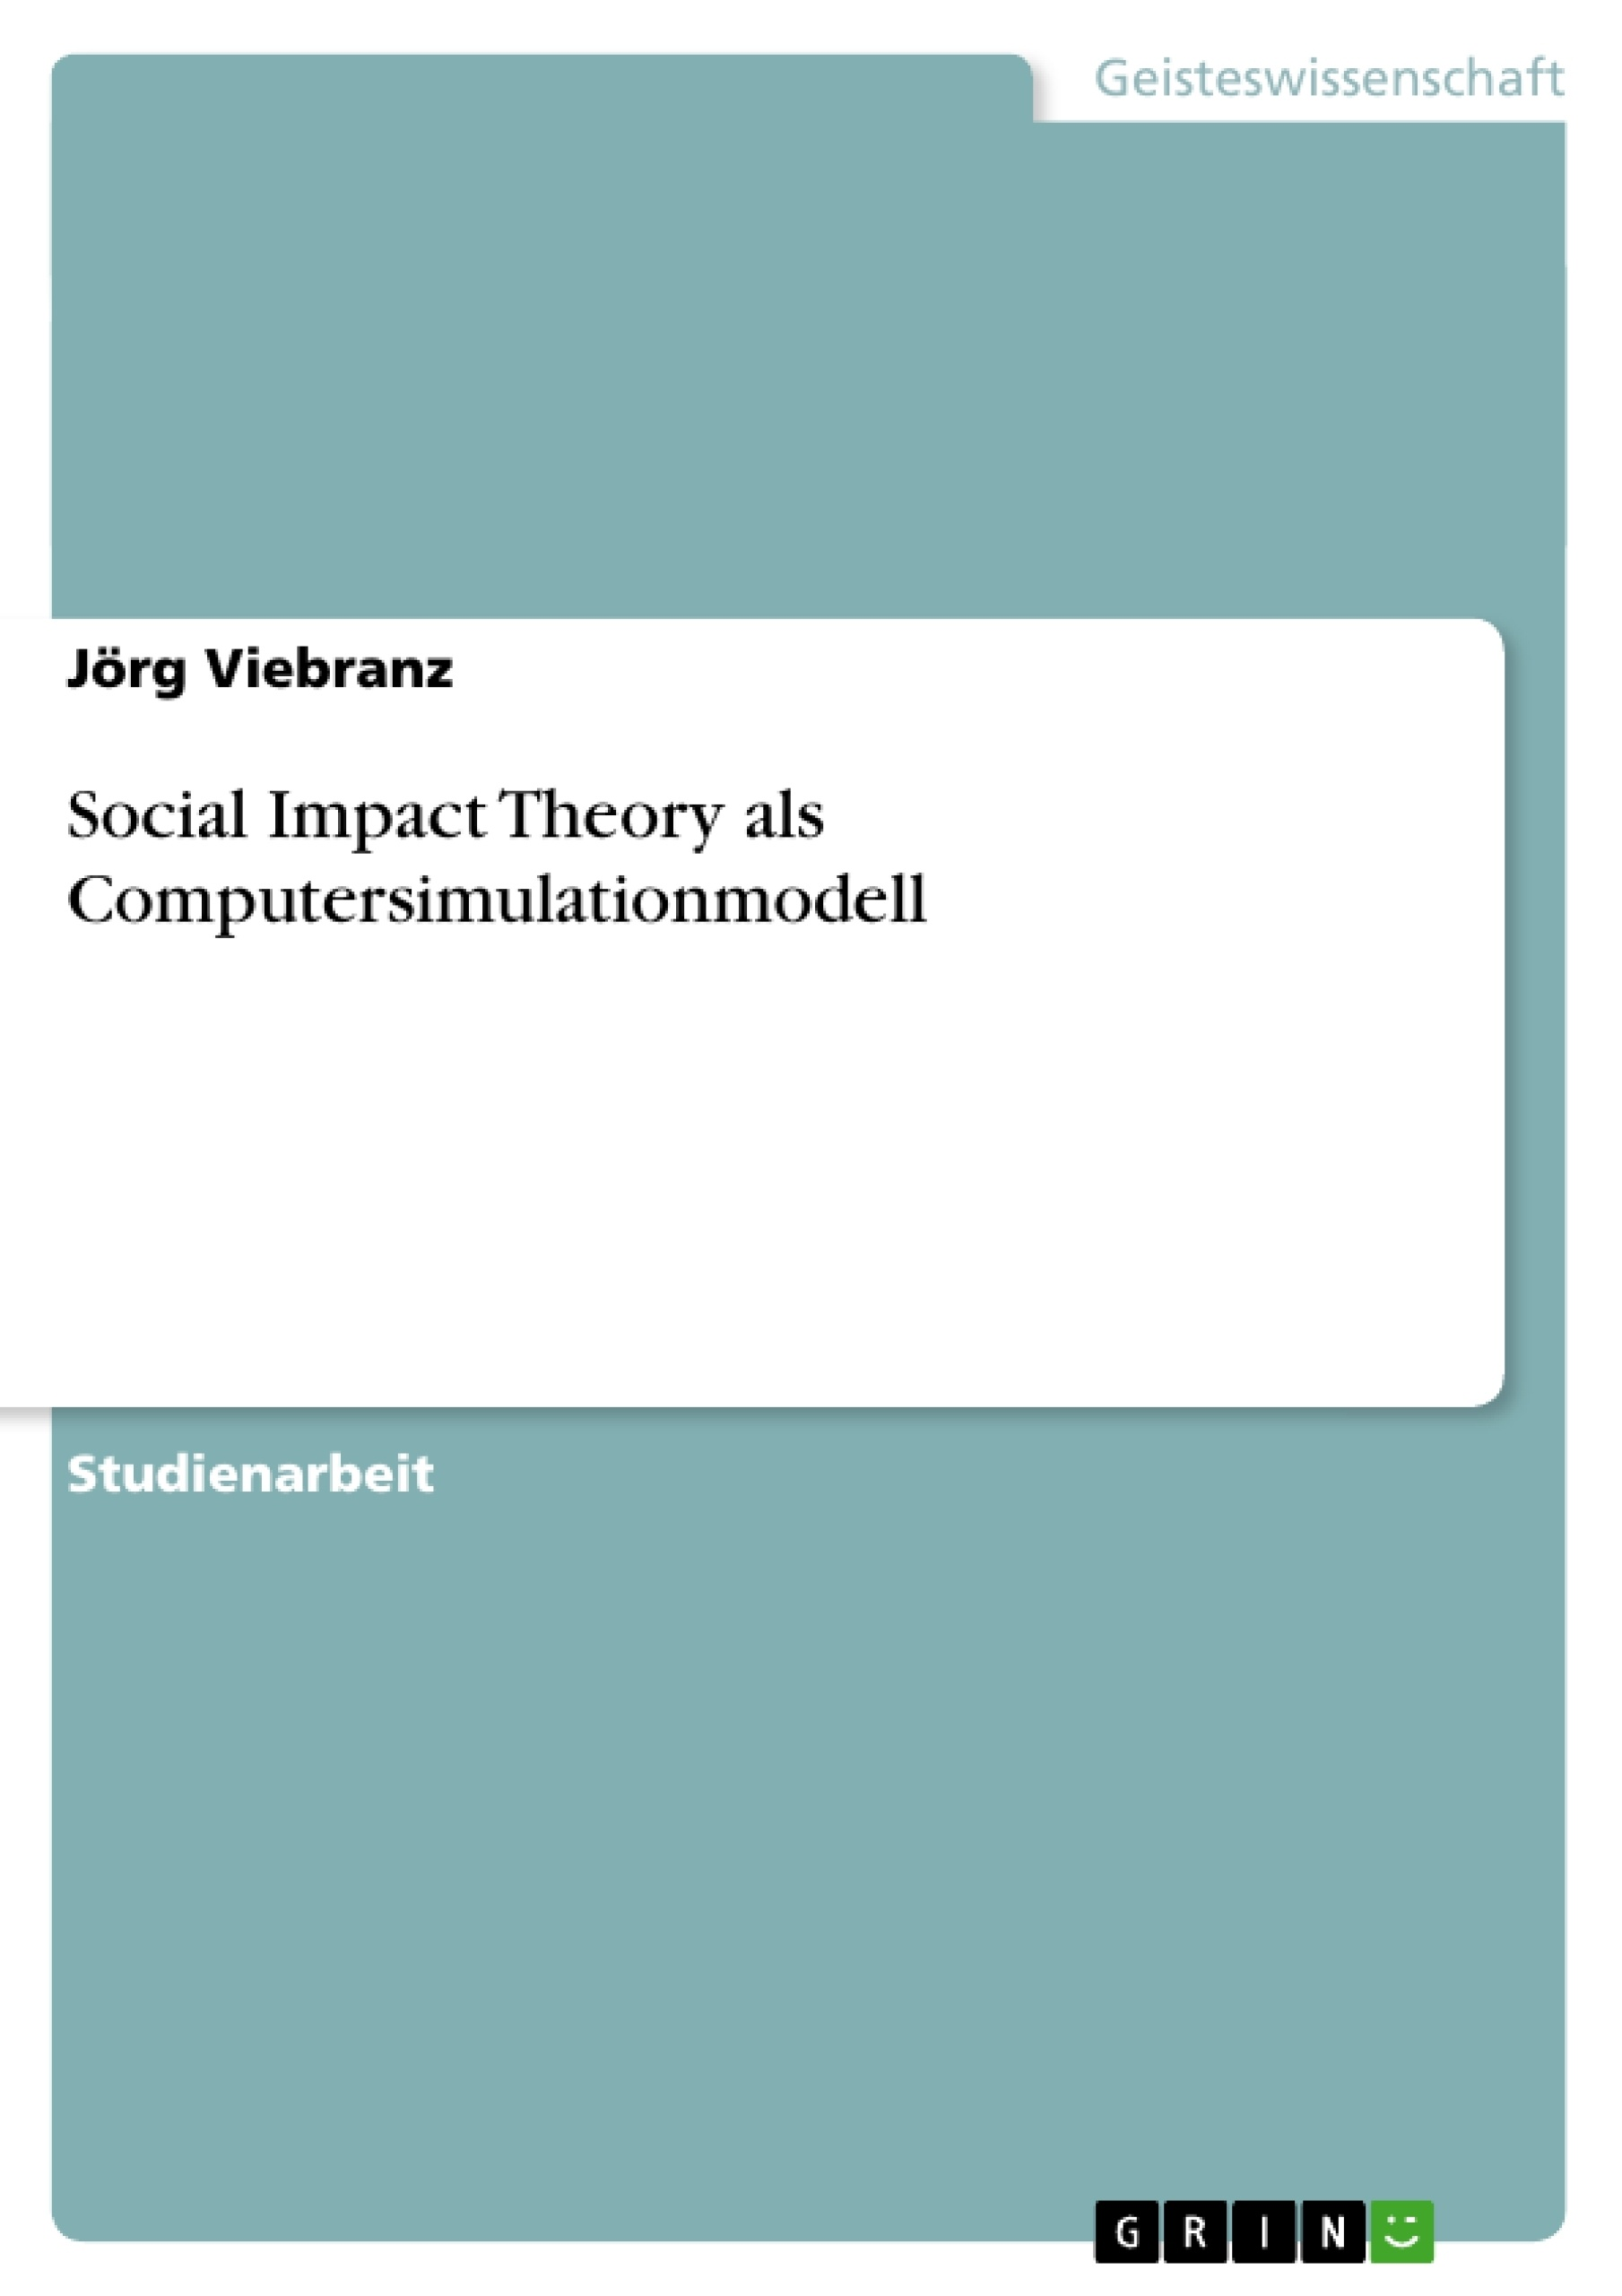 Titel: Social Impact Theory  als Computersimulationmodell